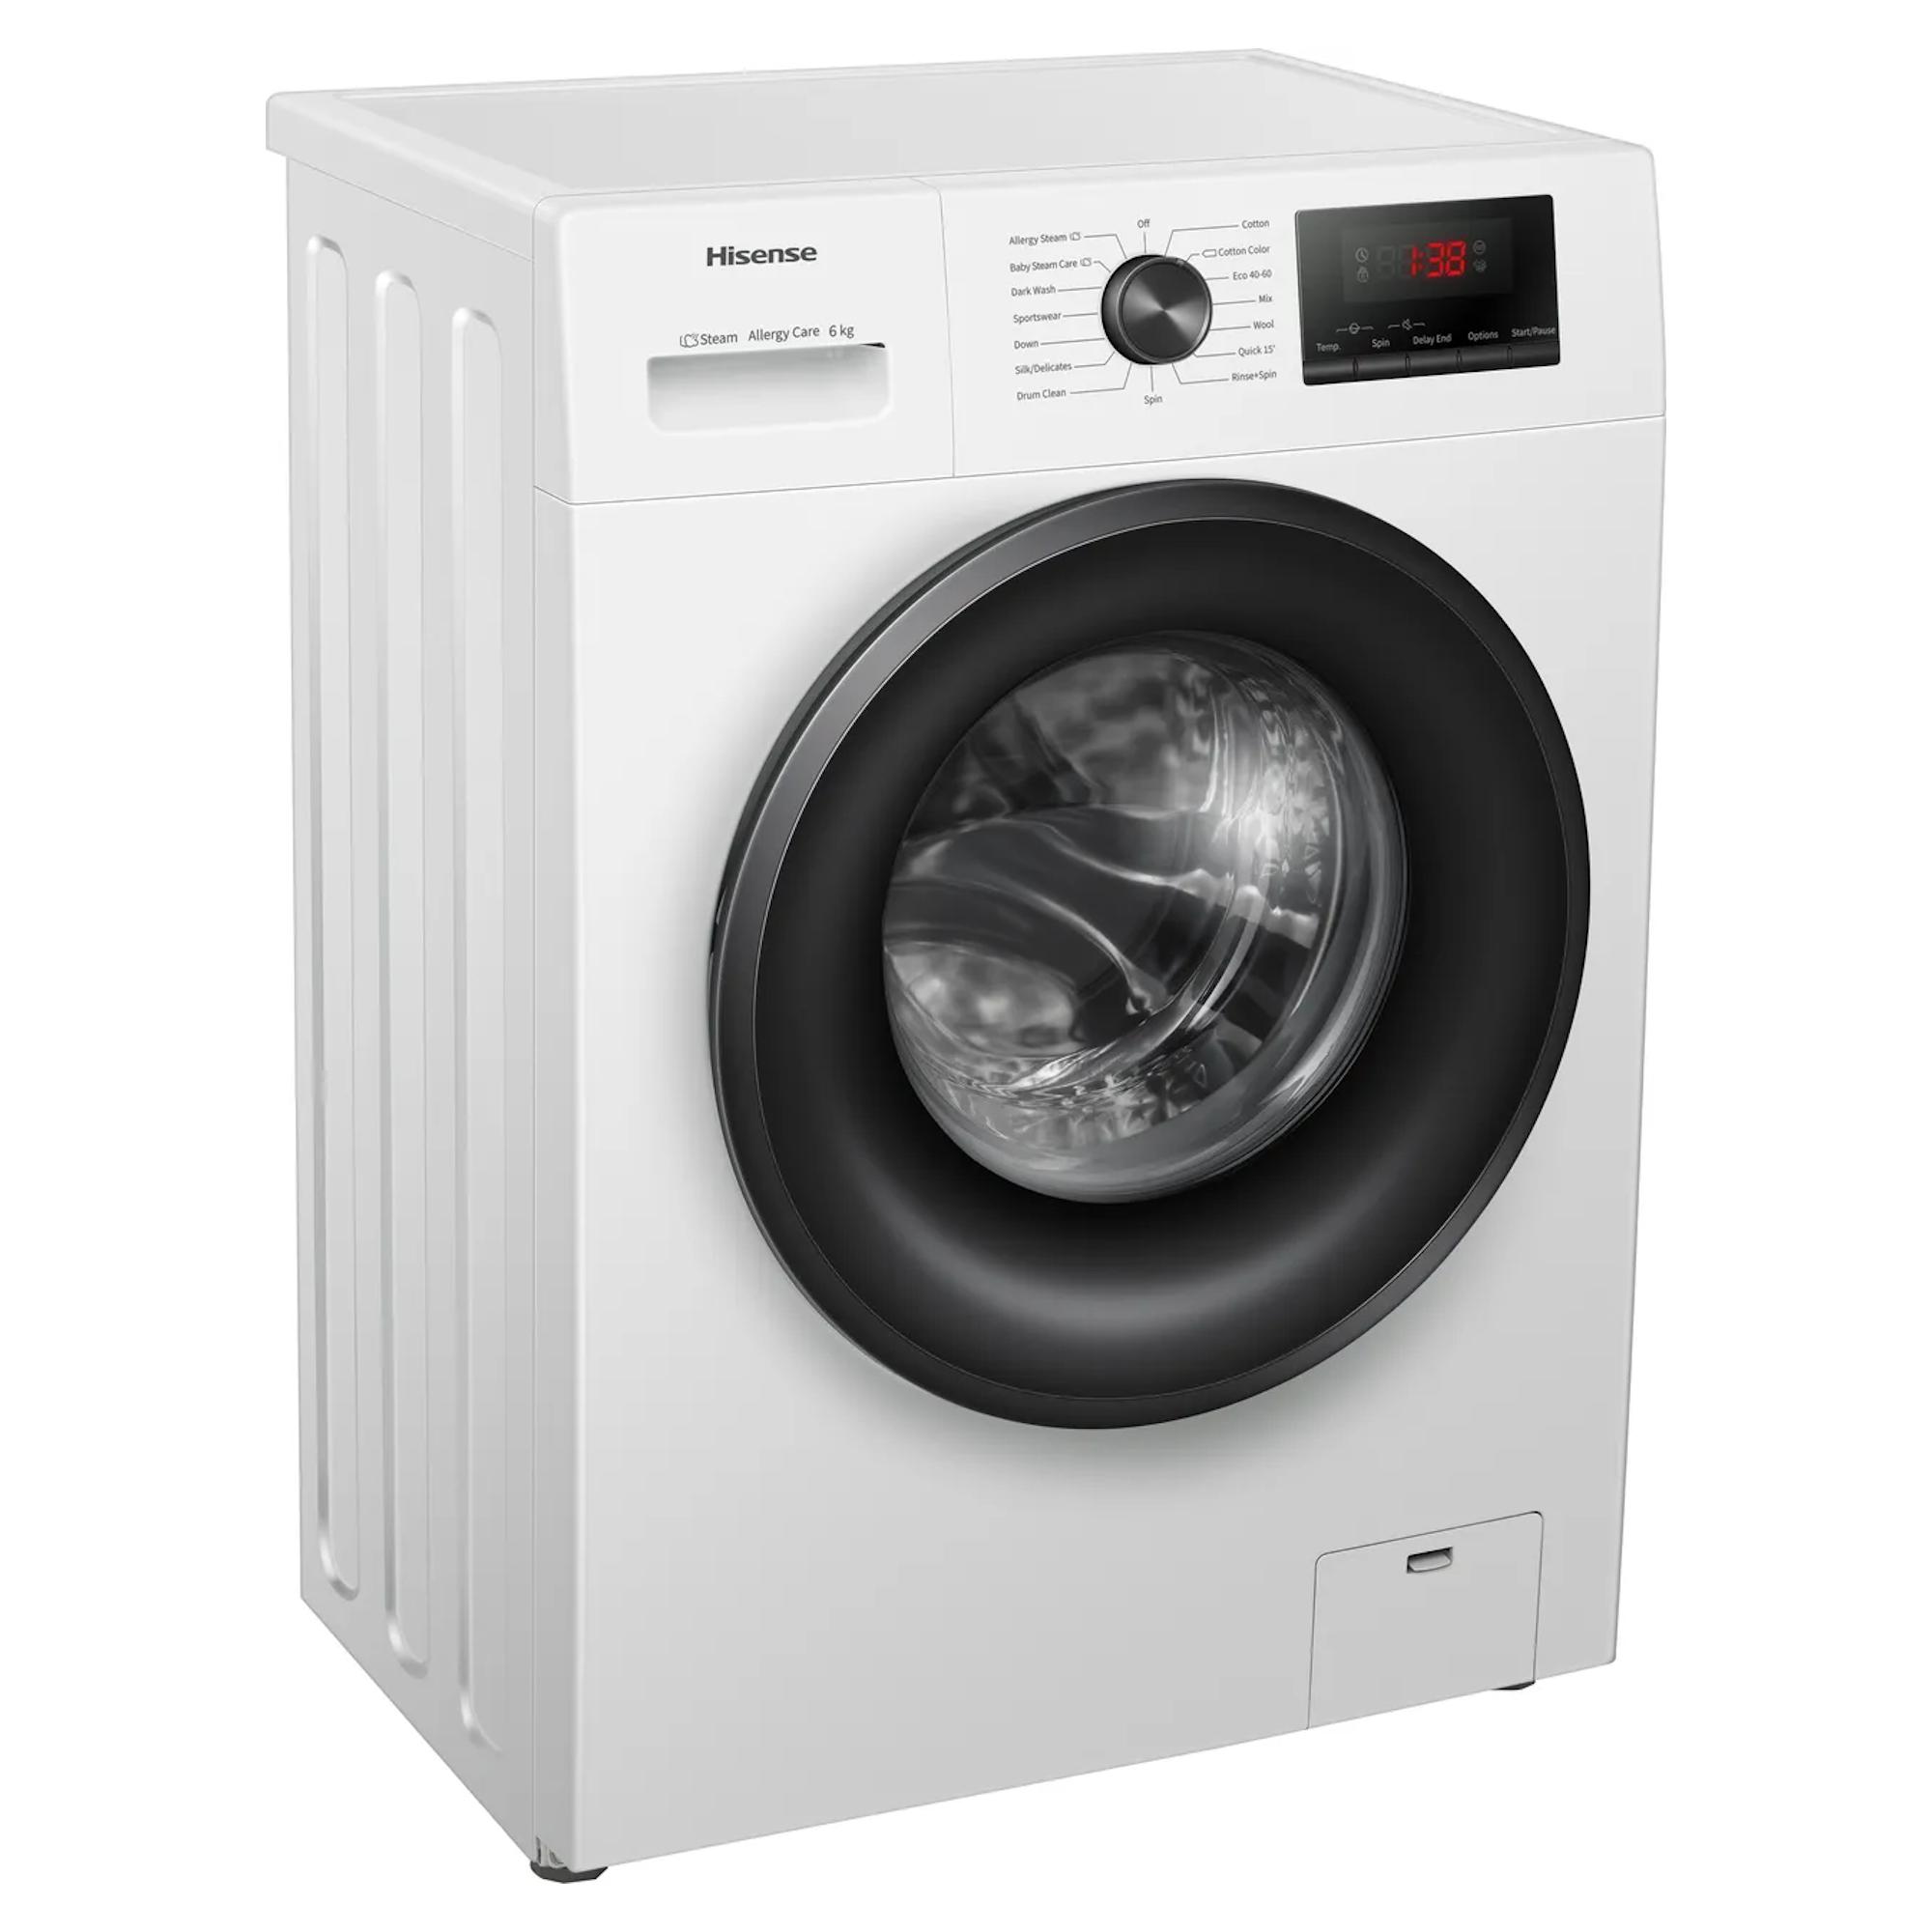 Hisense WFPV6012EM 6kg Washing Machine E Energy